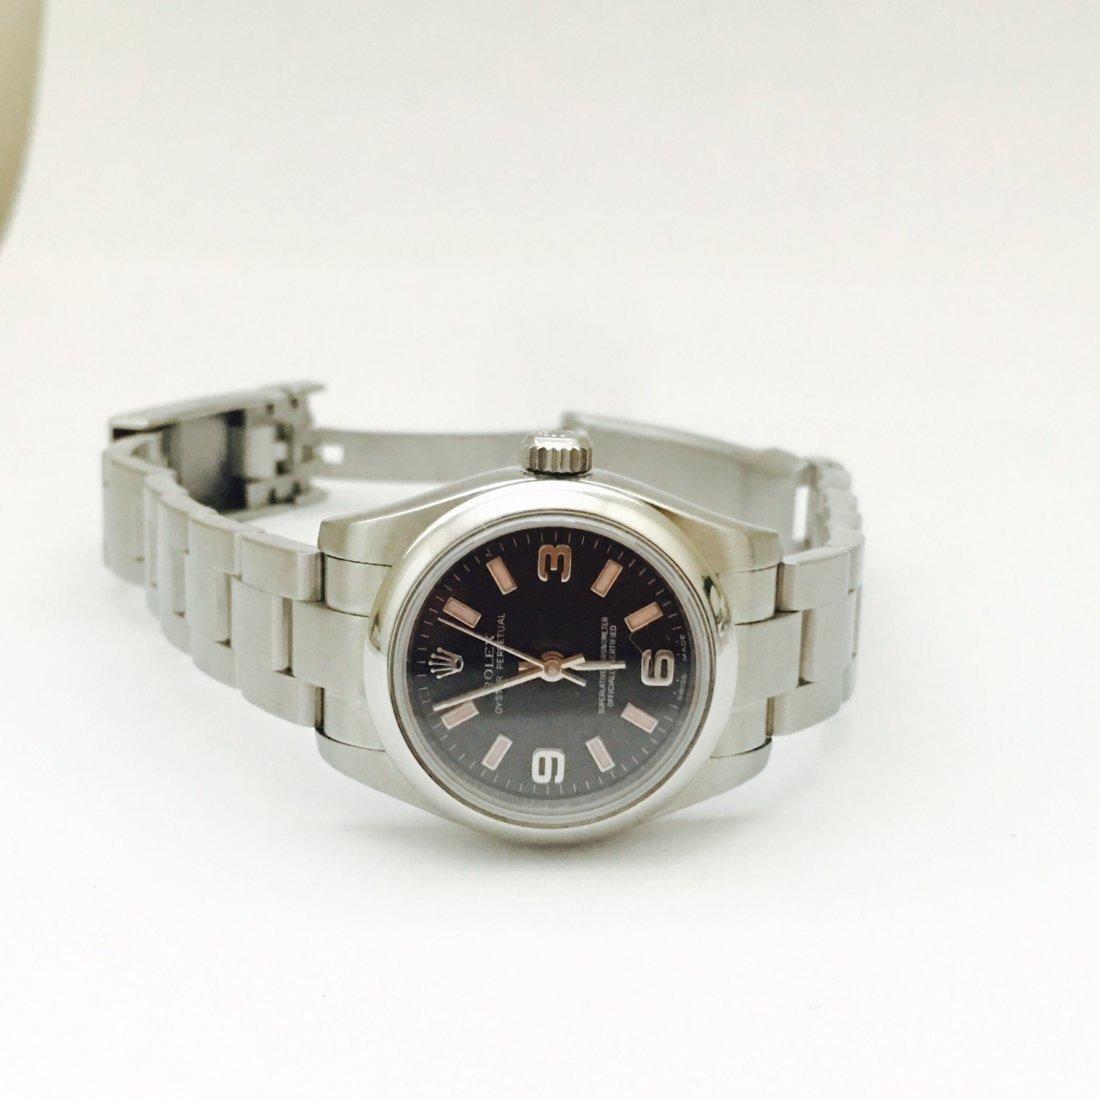 Rolex Oyster Perpetual Ladies Black Arabic Dial